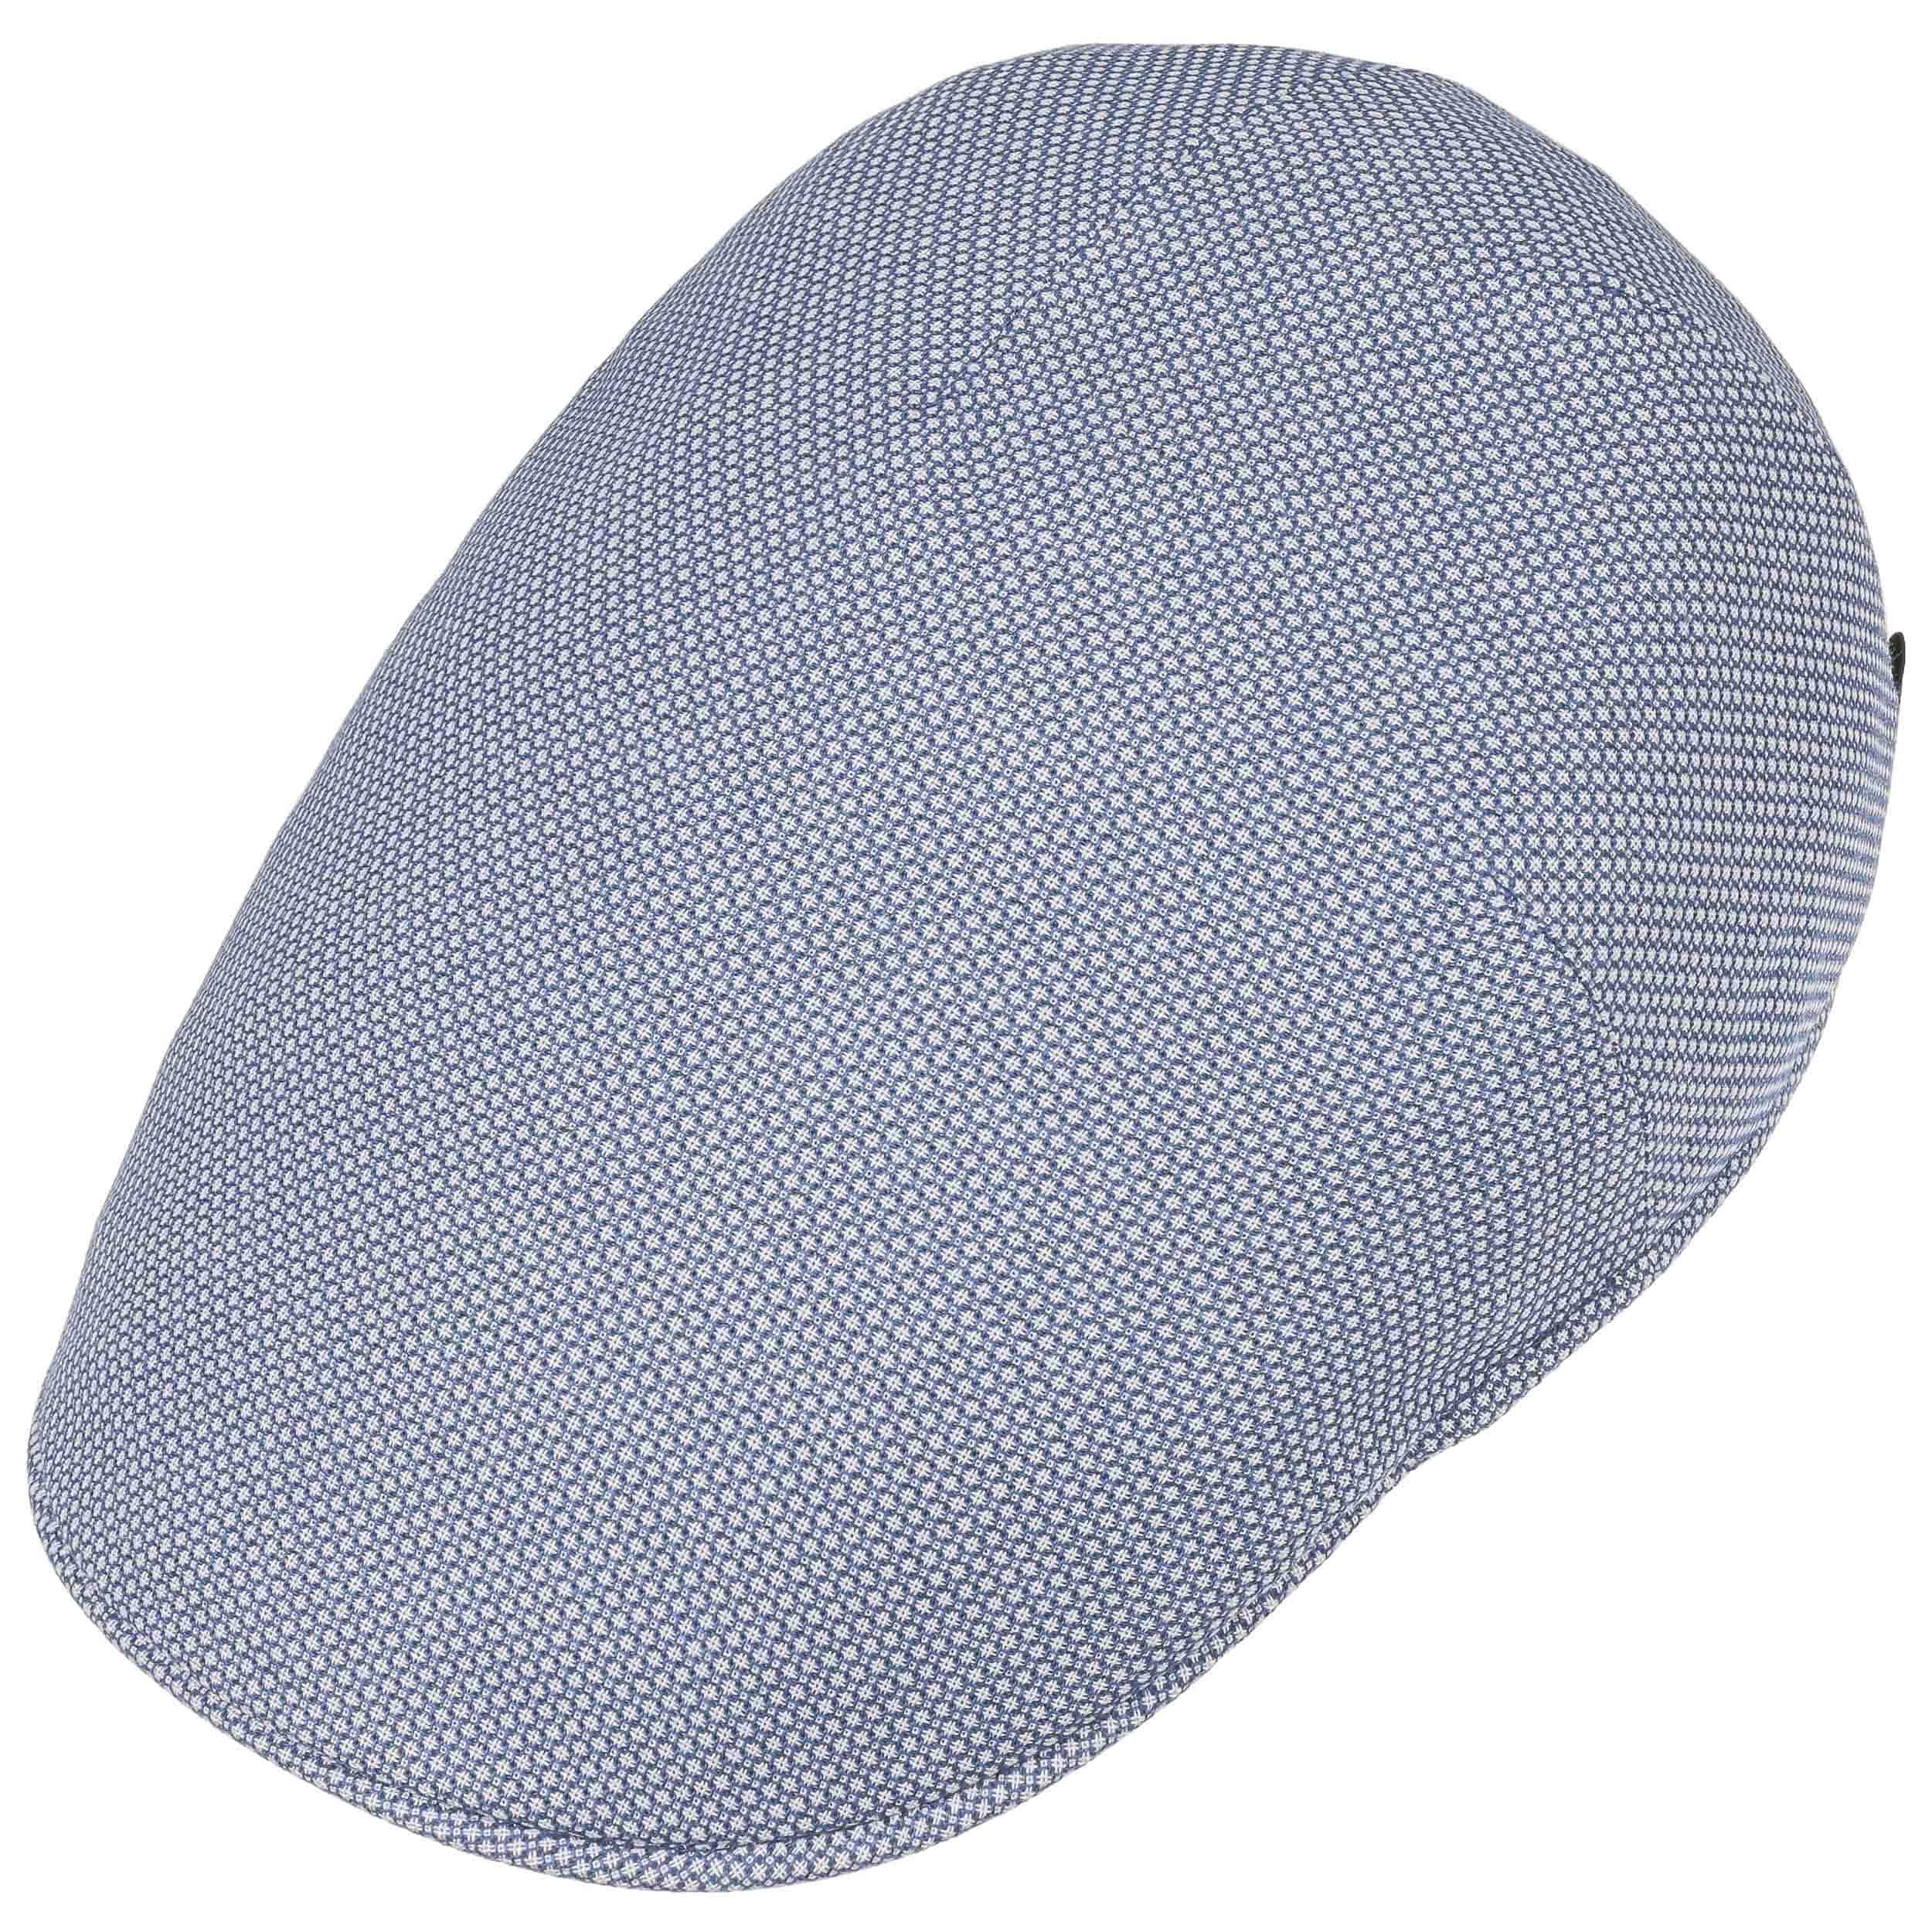 ... Circles Linen Cotton Flat Cap by Borsalino - light blue 1 ... bc5051204a74